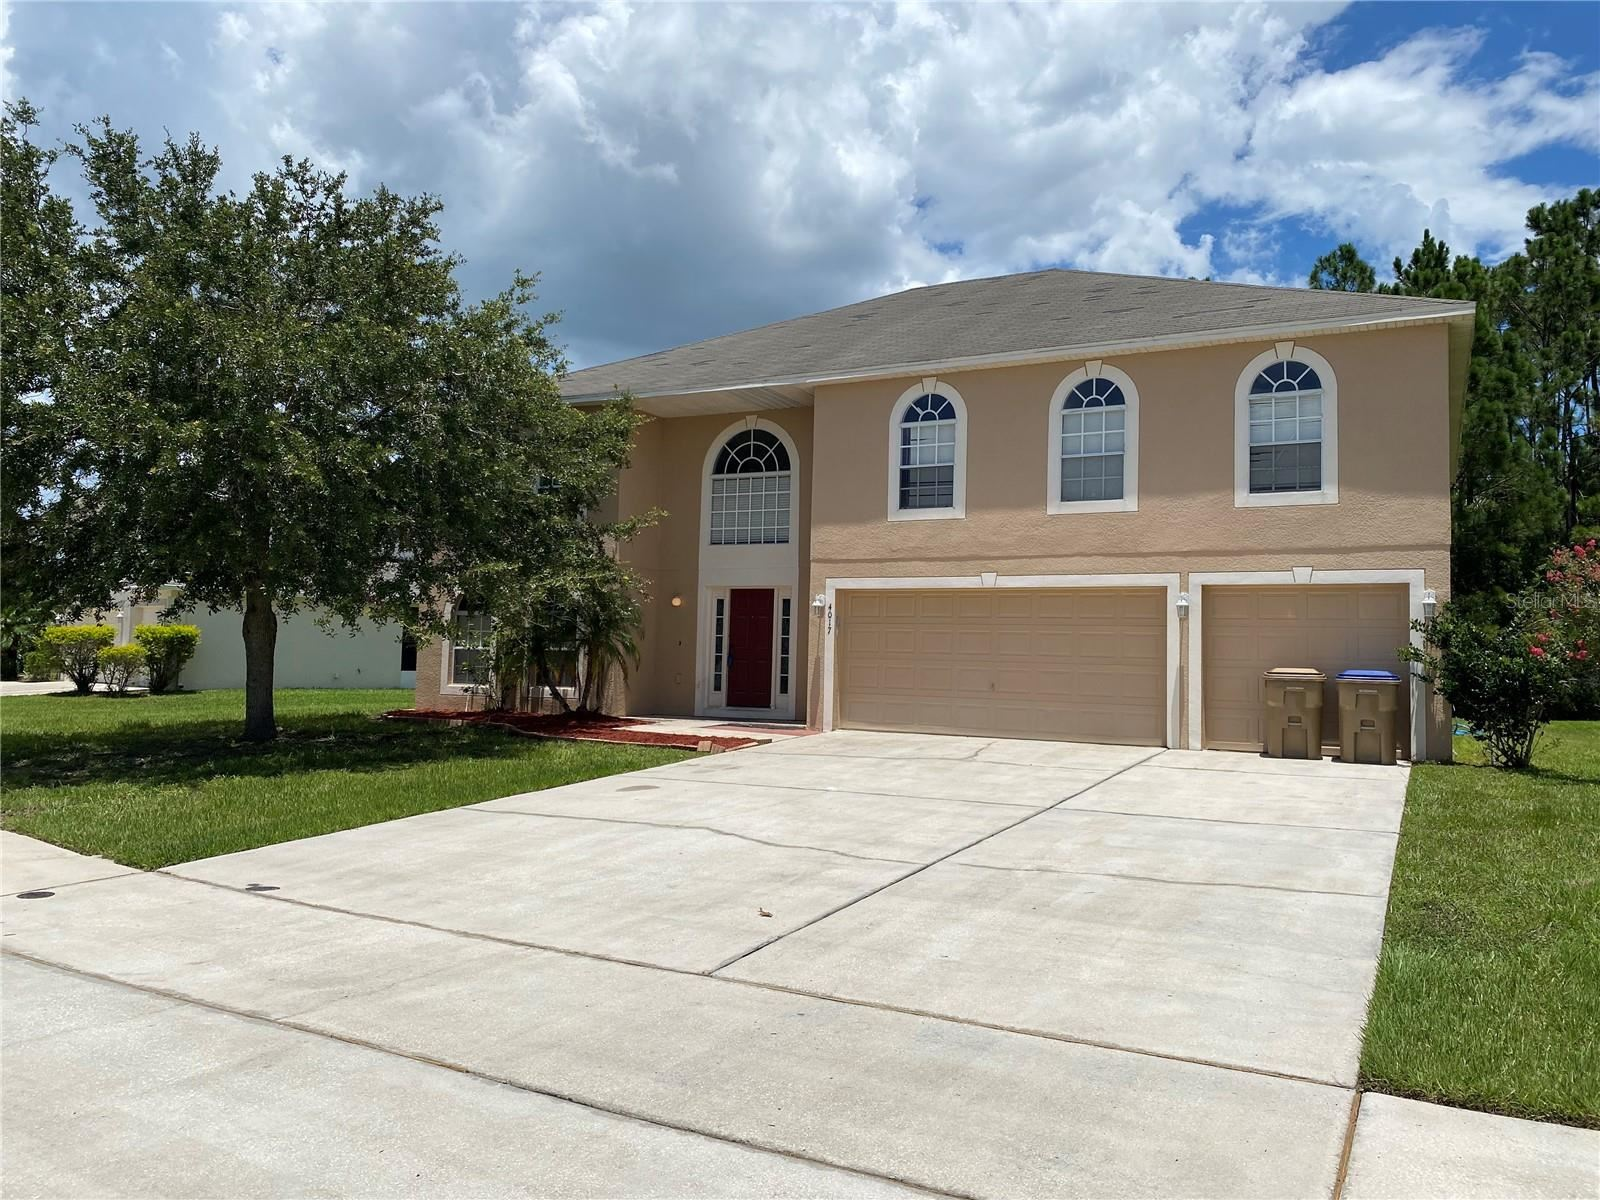 4017 GREENLEAF DRIVE, Kissimmee, FL 34744 - #: O5910045